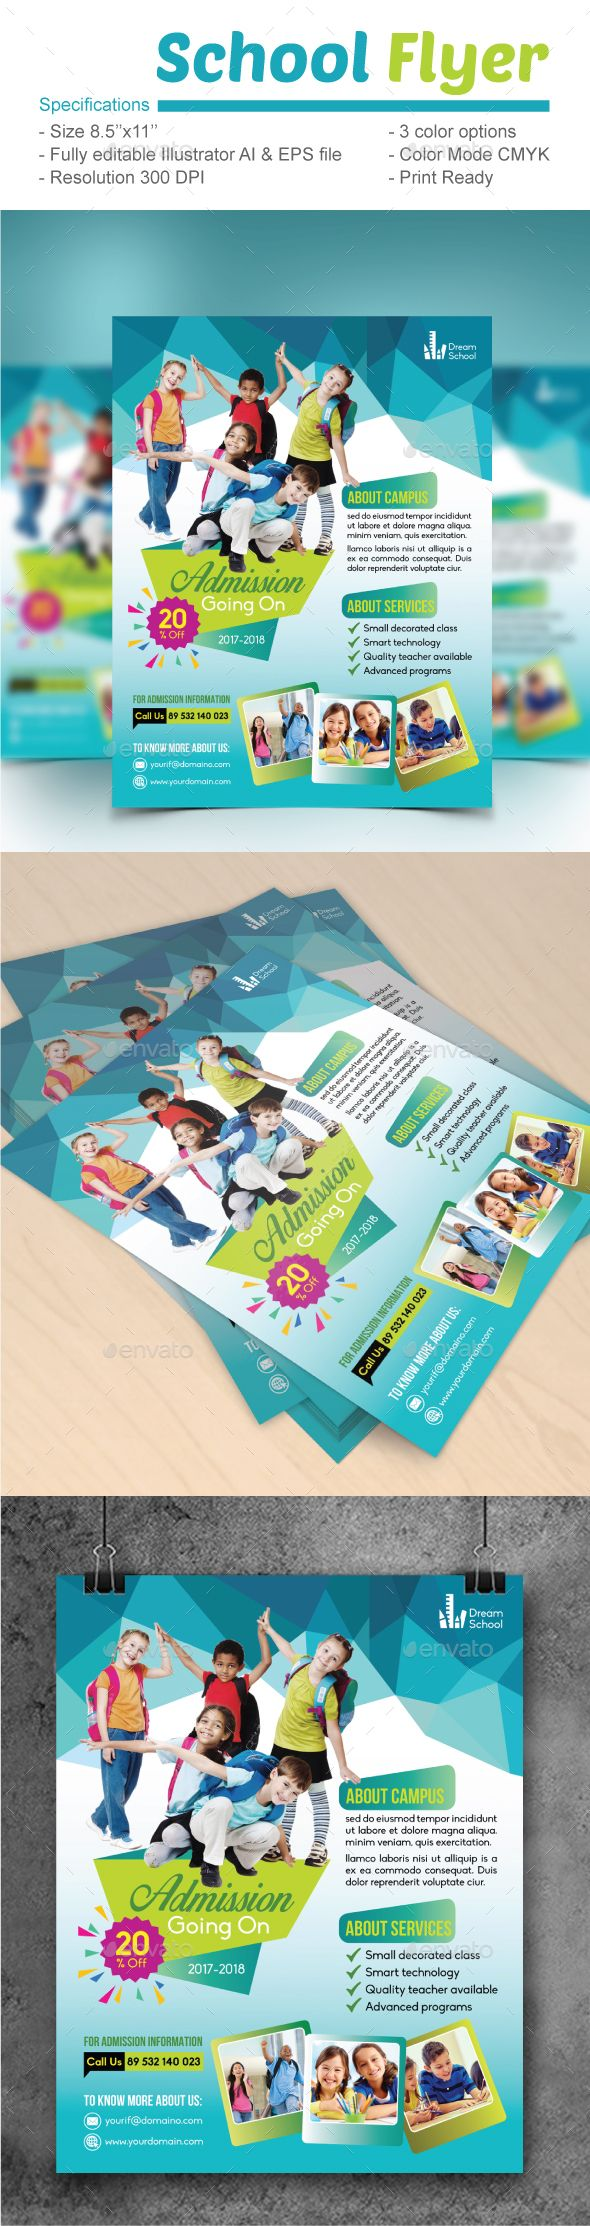 School Flyer Design Template - Flyers Design Print Template Vector EPS, AI Illustrator. Download here: https://graphicriver.net/item/school-flyer/19400231?ref=yinkira